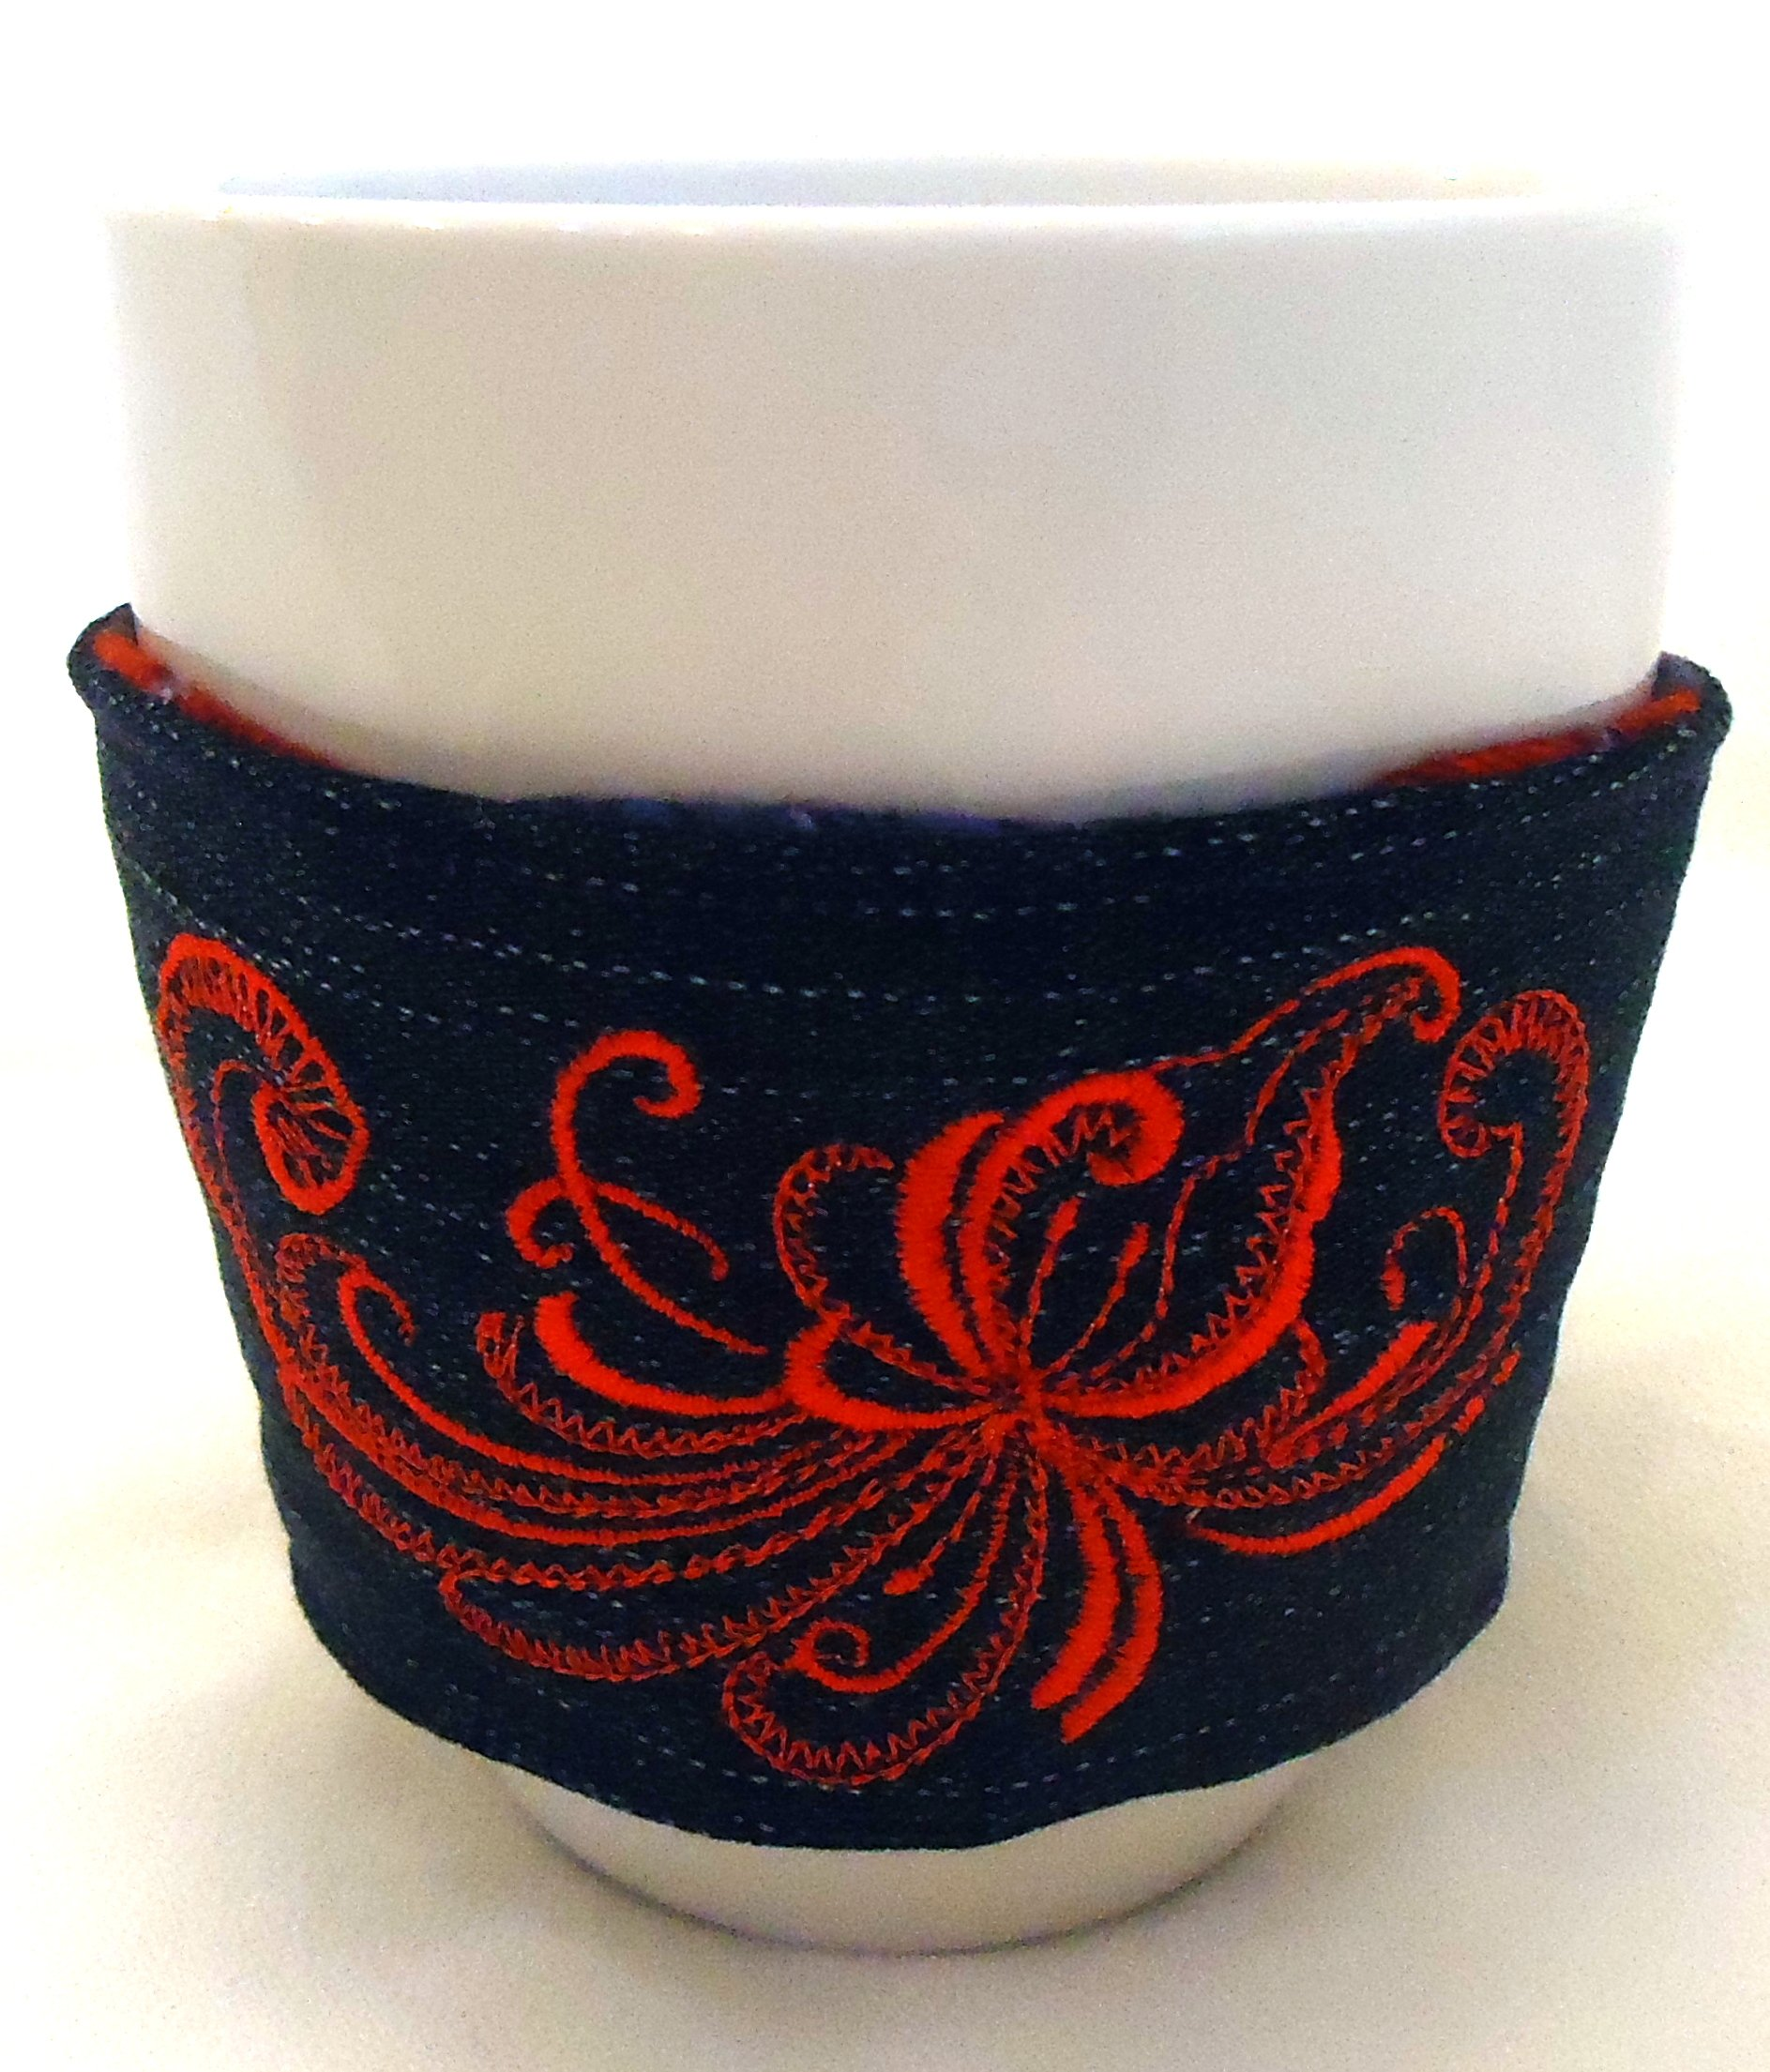 Integrity Designs Denim Scandinavian Rosemaling Embroidered Coffee Sleeve Tea Cup Cozy